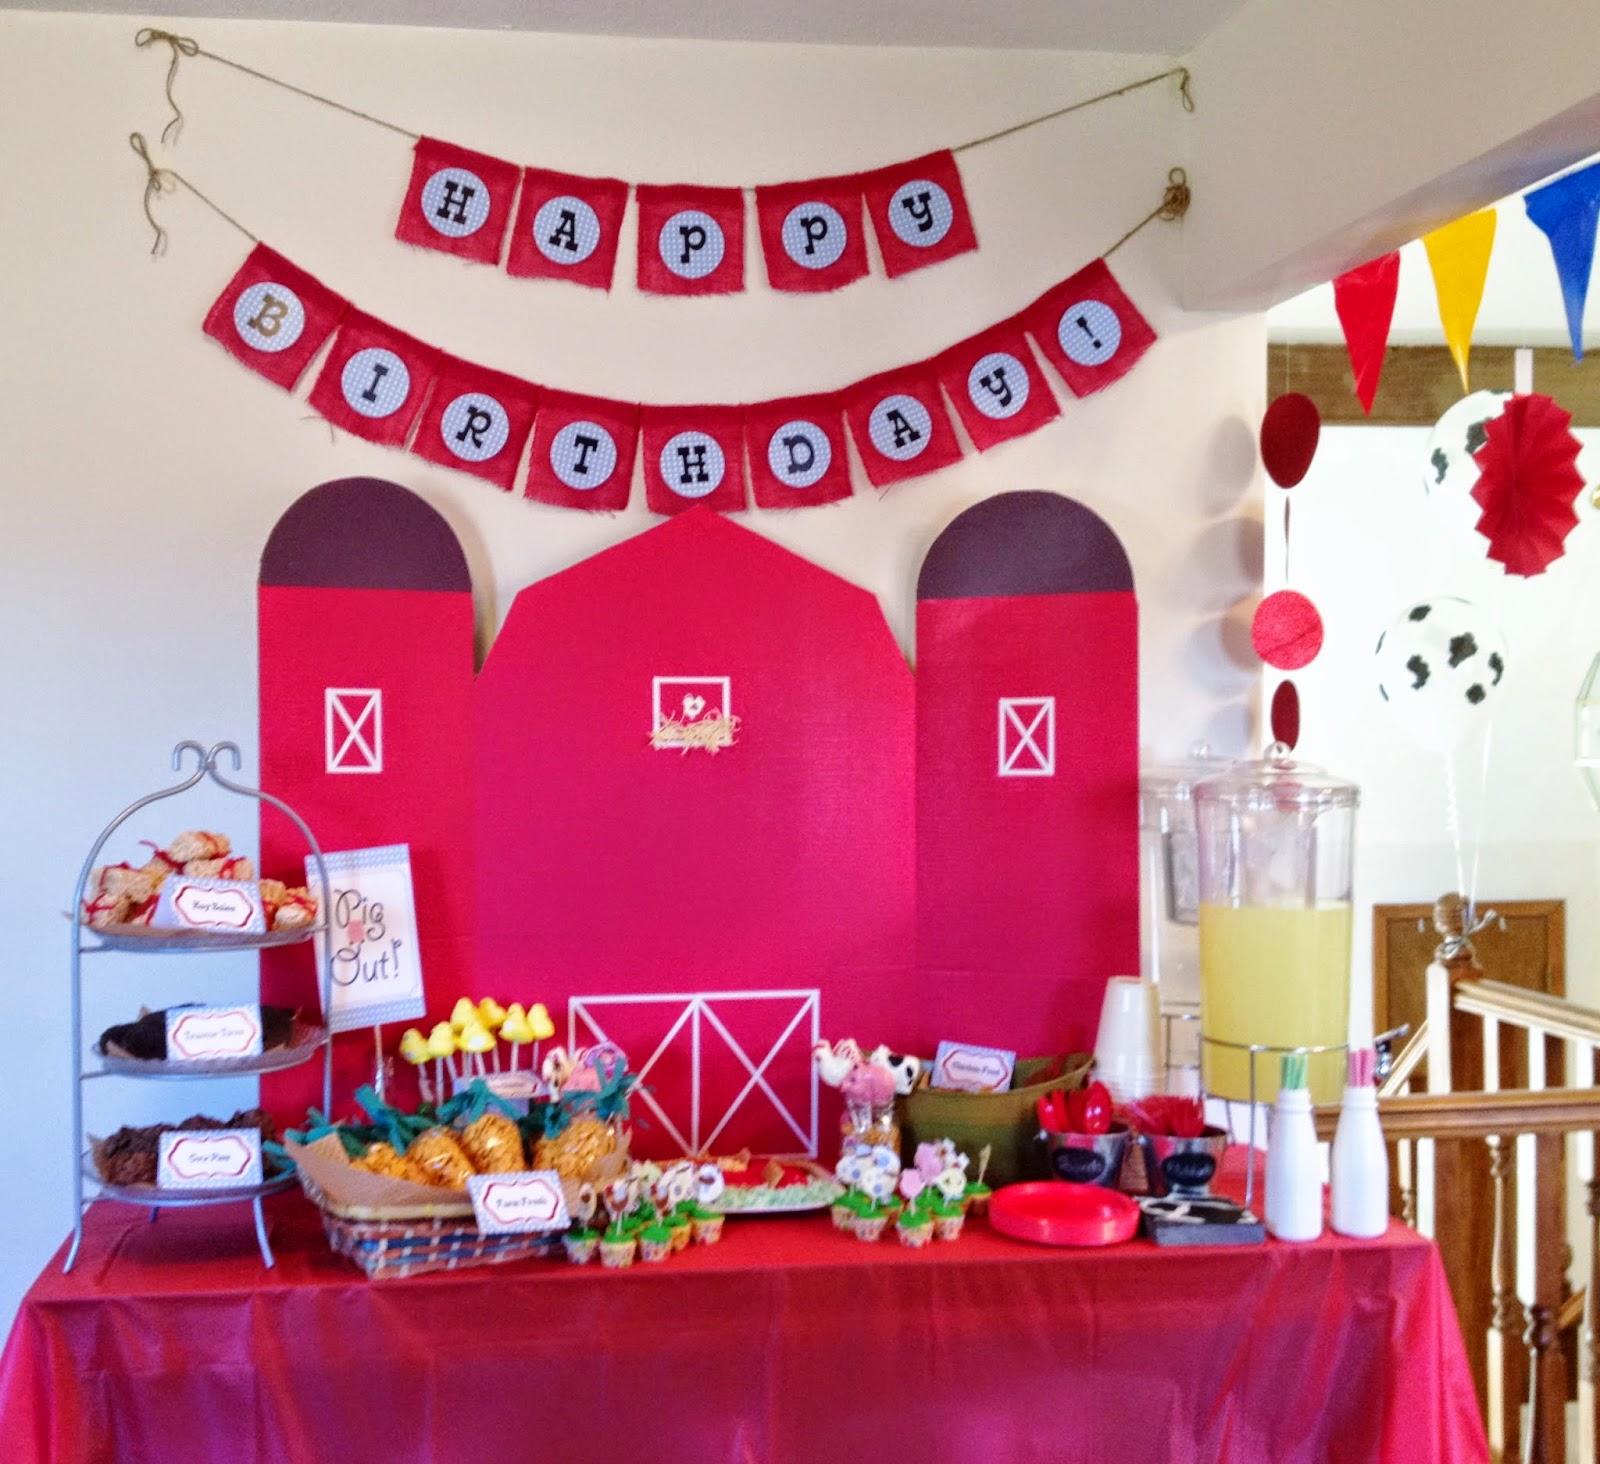 Unique digital designs and scrapbook kits: Sweetie Pie Farm Party